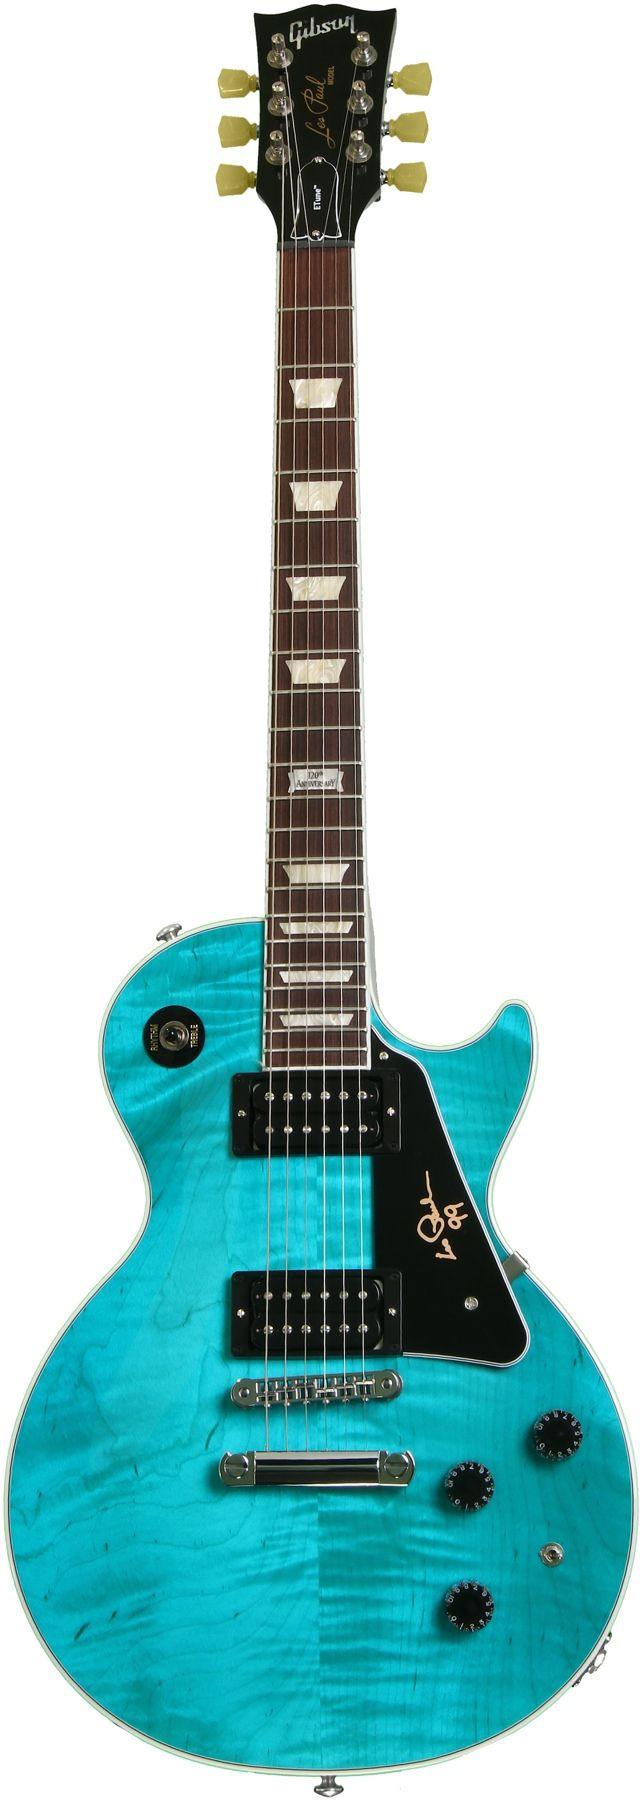 Gibson Les Paul Signature 2014 Carribean Blue